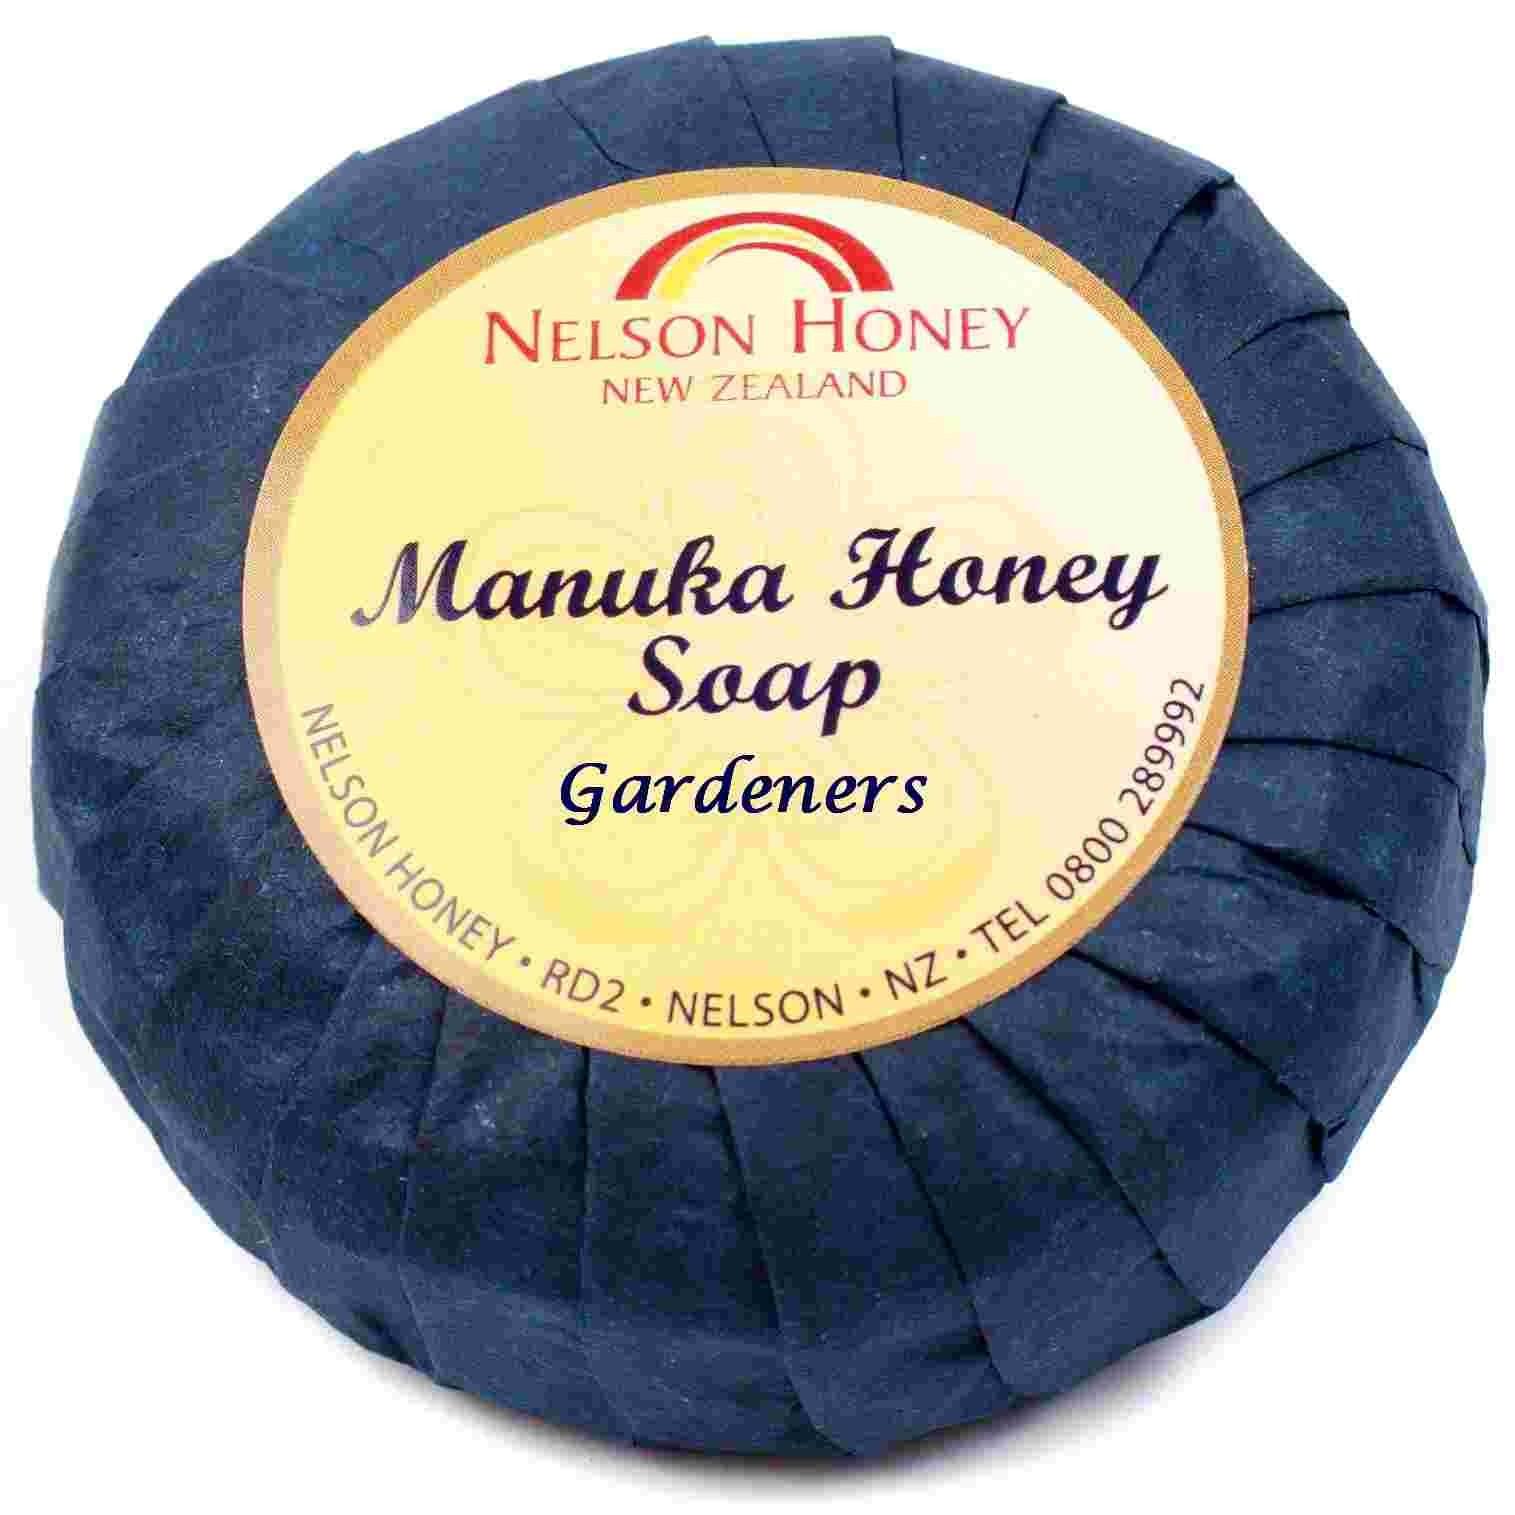 Nelson Honey麥盧卡蜂蜜園藝皂